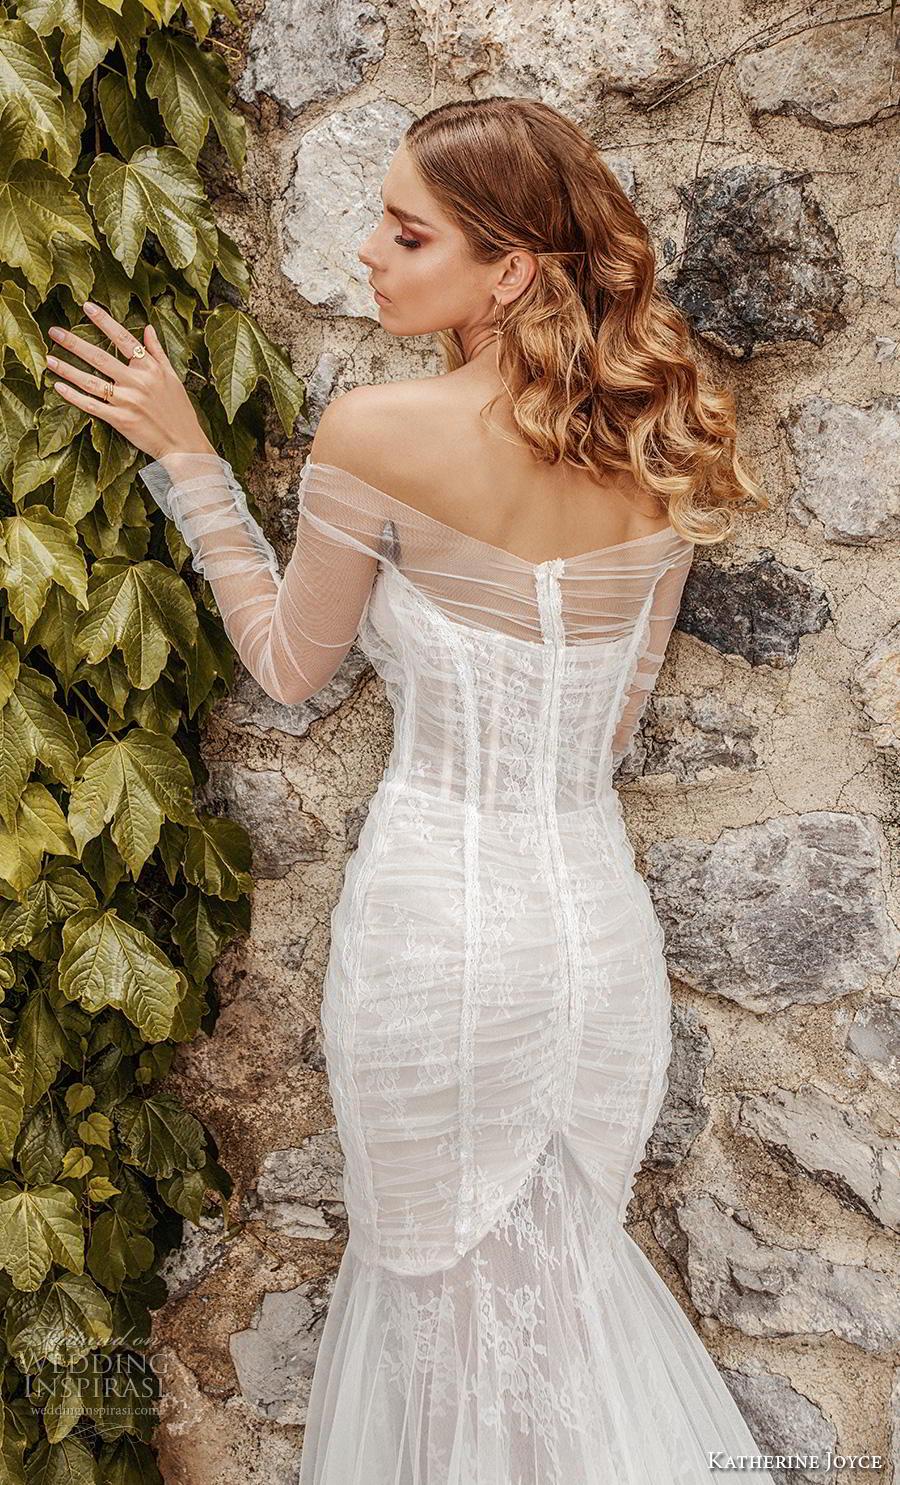 katherine joyce 2019 bridal long sleeves off the shoulder sweetheart neckline ruched bodie elegant sexy mermaid wedding dress medium train (9) zbv